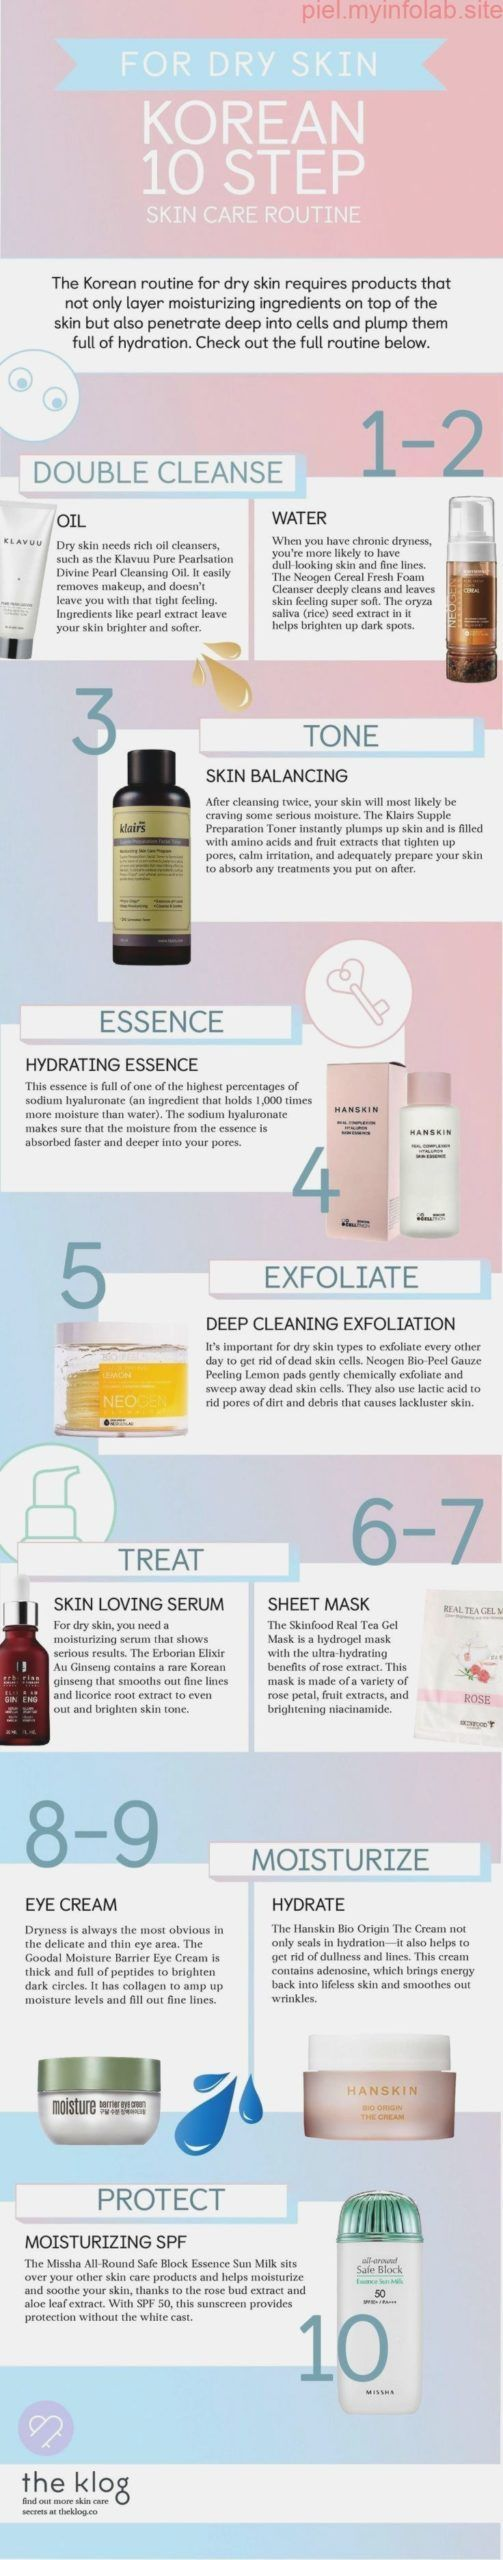 Korean Skin Care Routine Retinol Also Skincare Fridge Online With Skincare Trend Cuidado De La Piel Coreano Rutina De Cuidado De La Piel Retinol